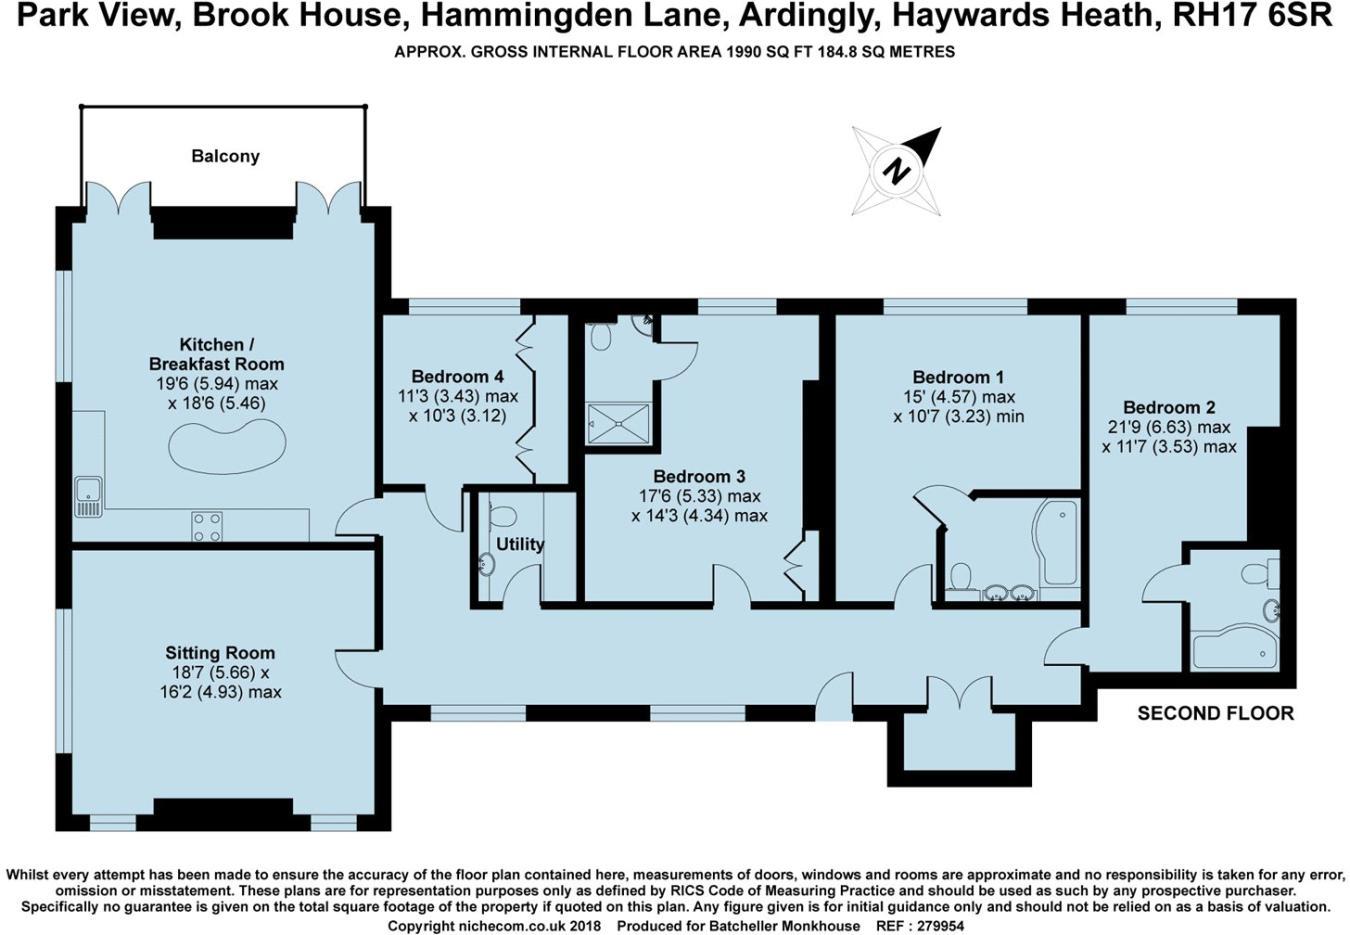 4 bedroom flat for sale in Brook House, Hammingden Lane, RH17